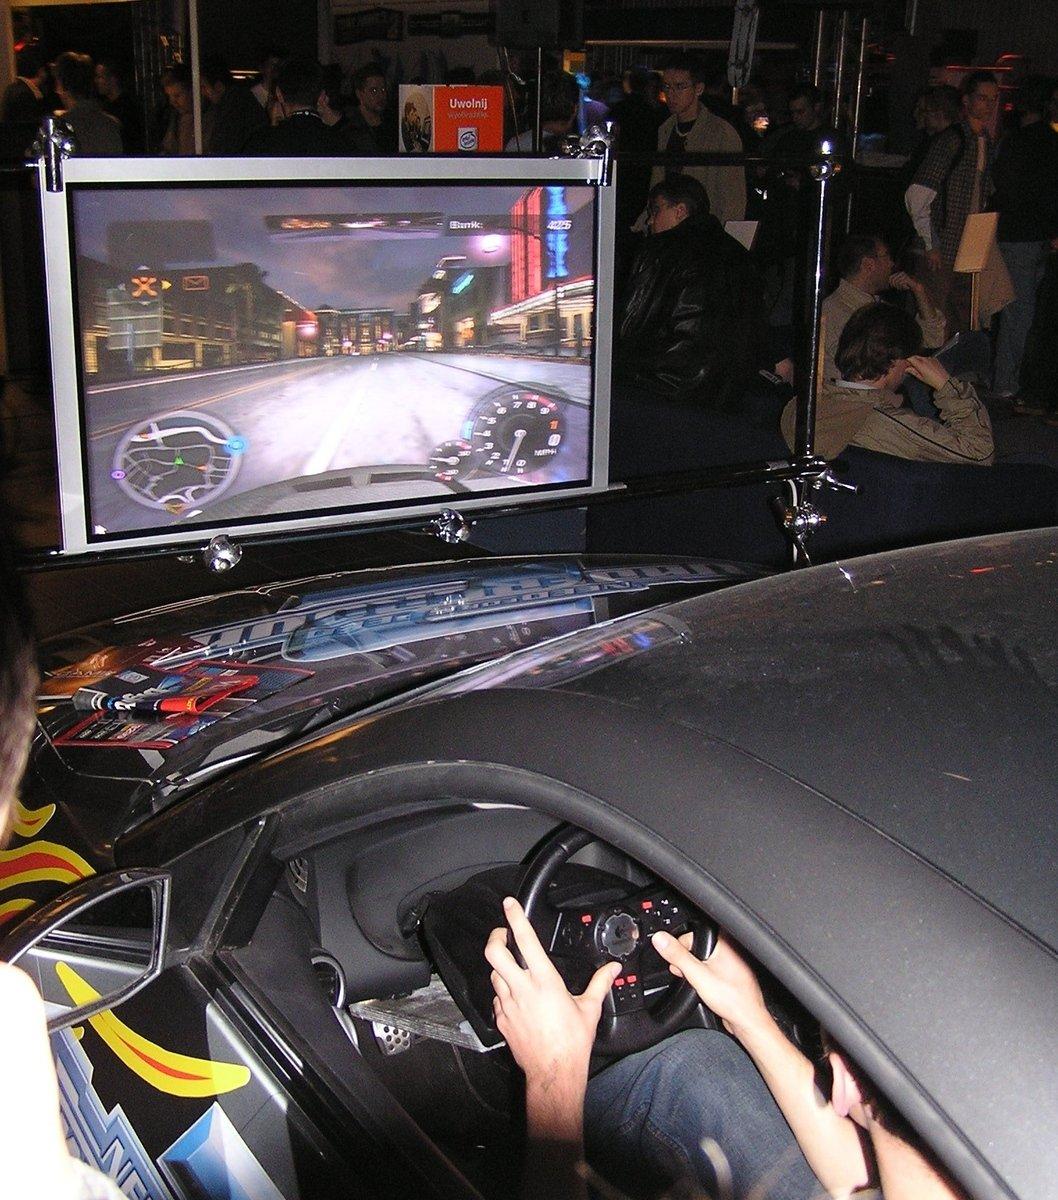 Where To Full Oil In Old Car Car Simulator